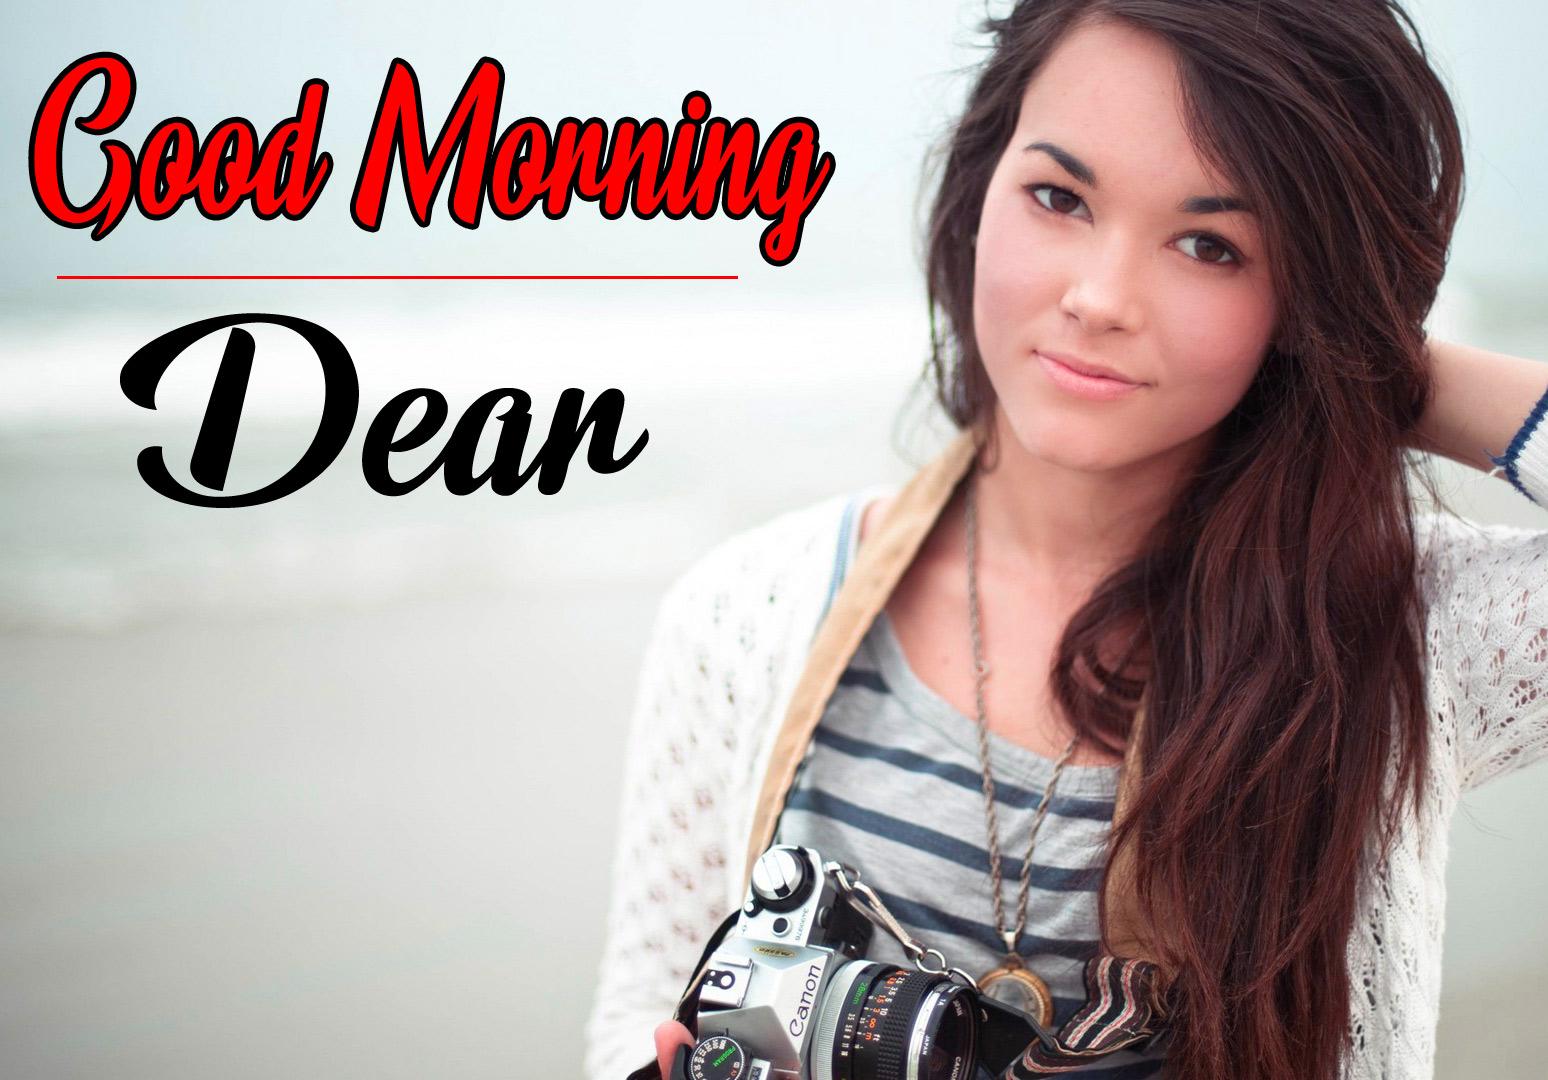 good morning Images for girls 20